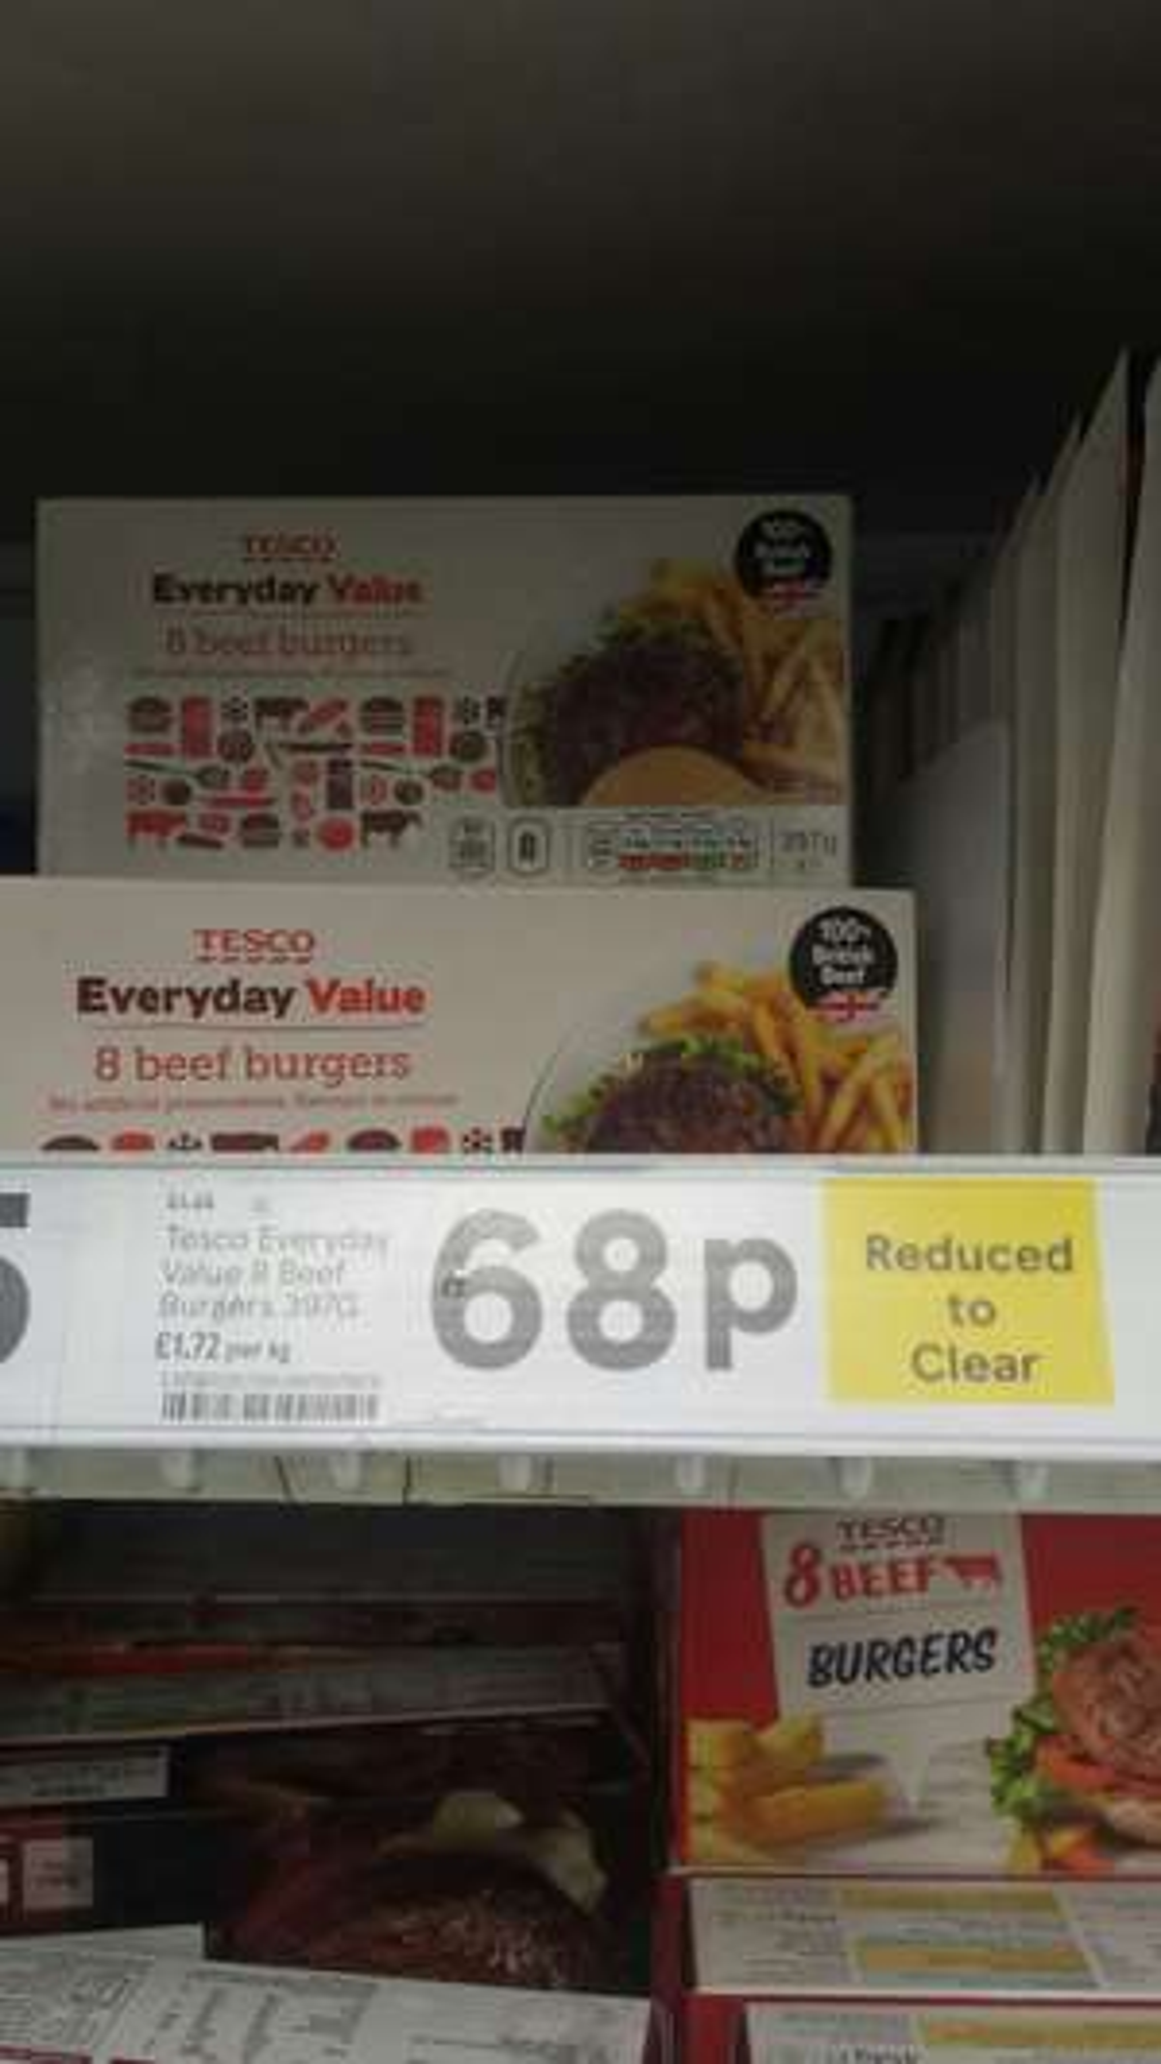 Tesco Everyday Value - 8 Beef Burgers 68p instore